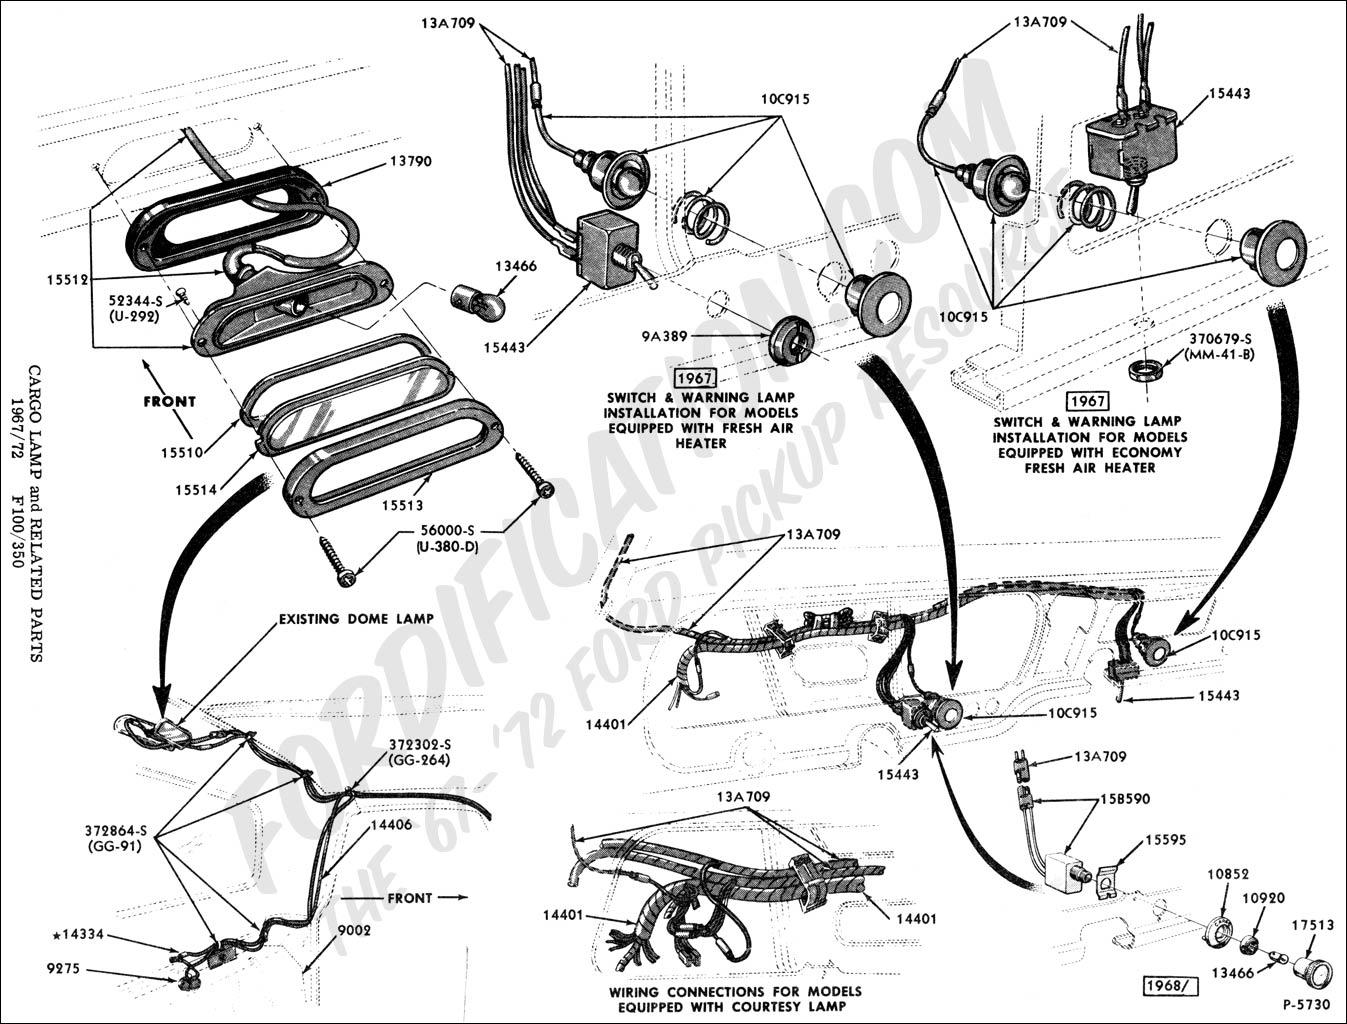 1996 gm 4l60e transmission diagram